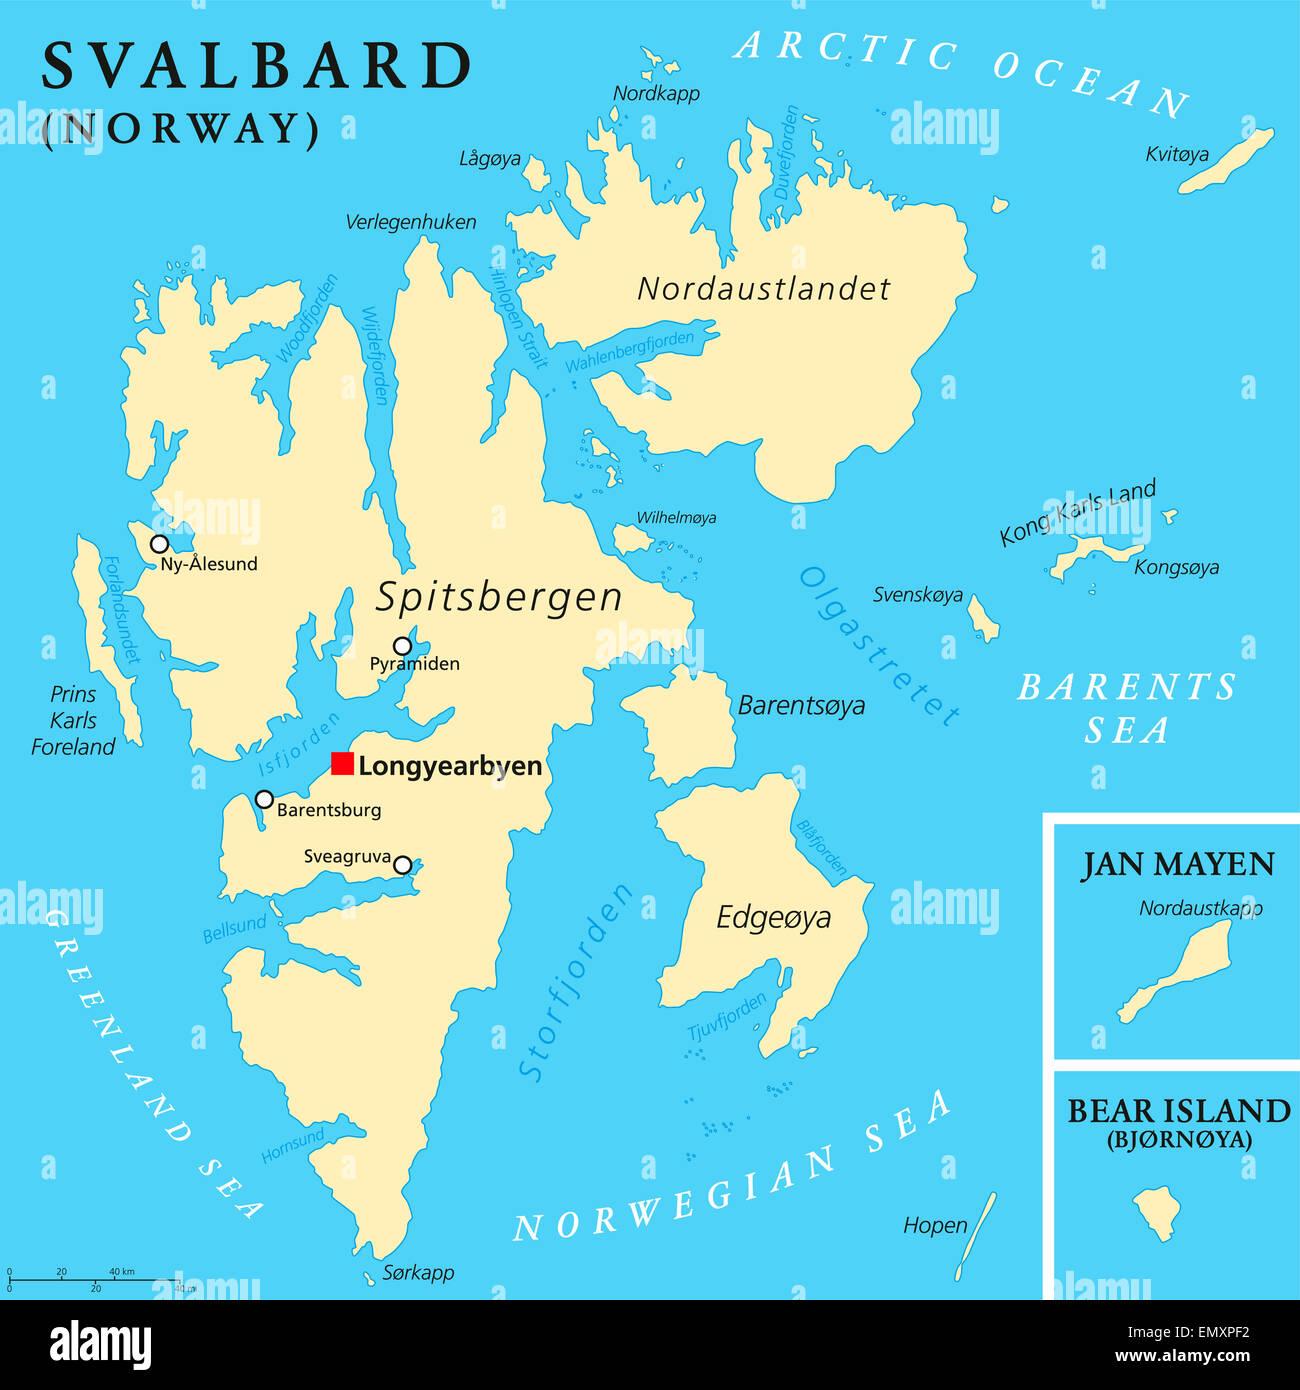 Svalbard Political Map Stock Photo: 81723014 - Alamy